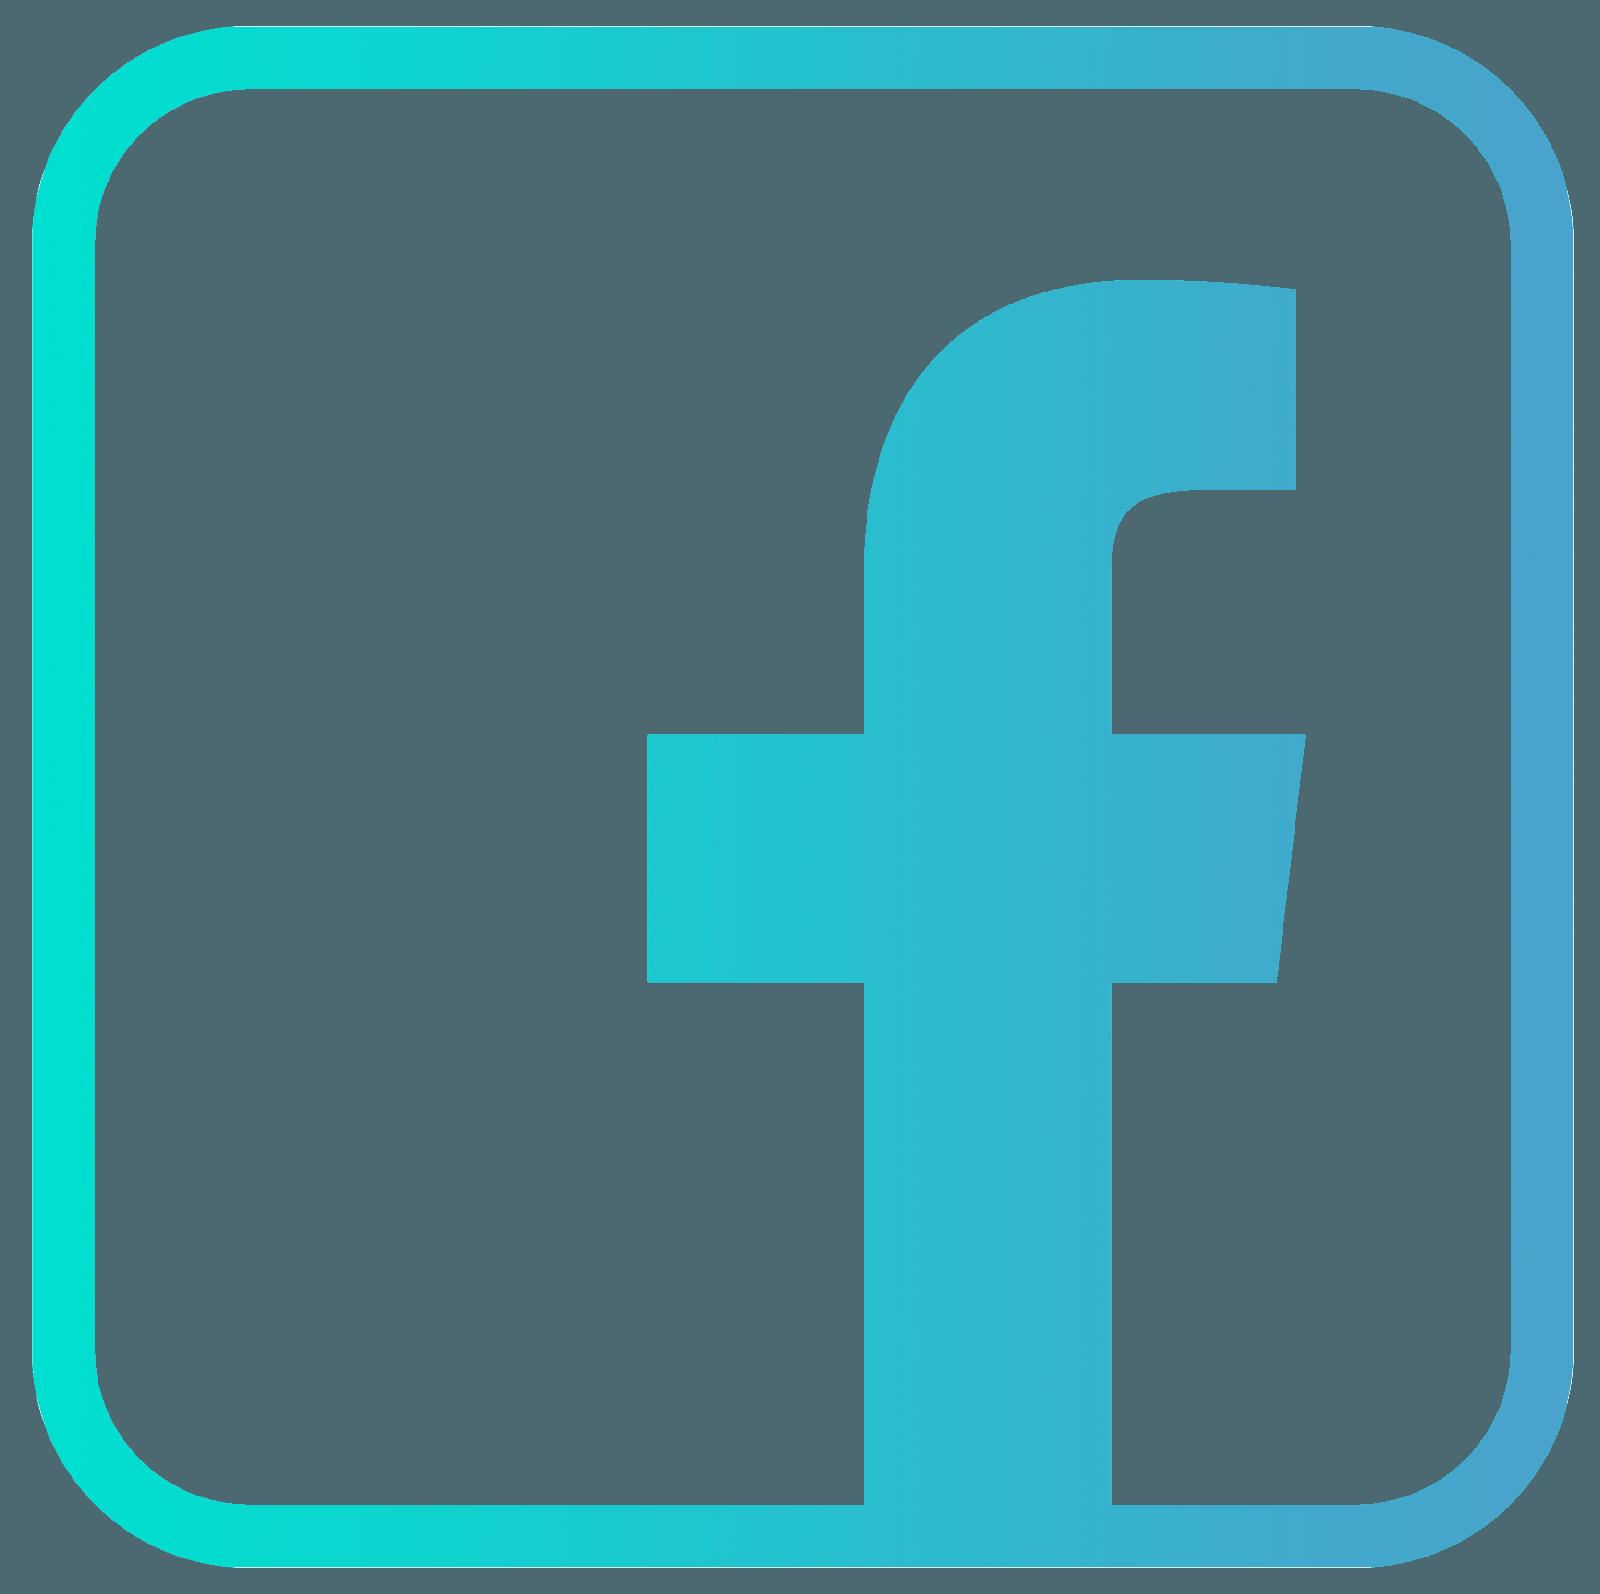 facebook-smm-ico